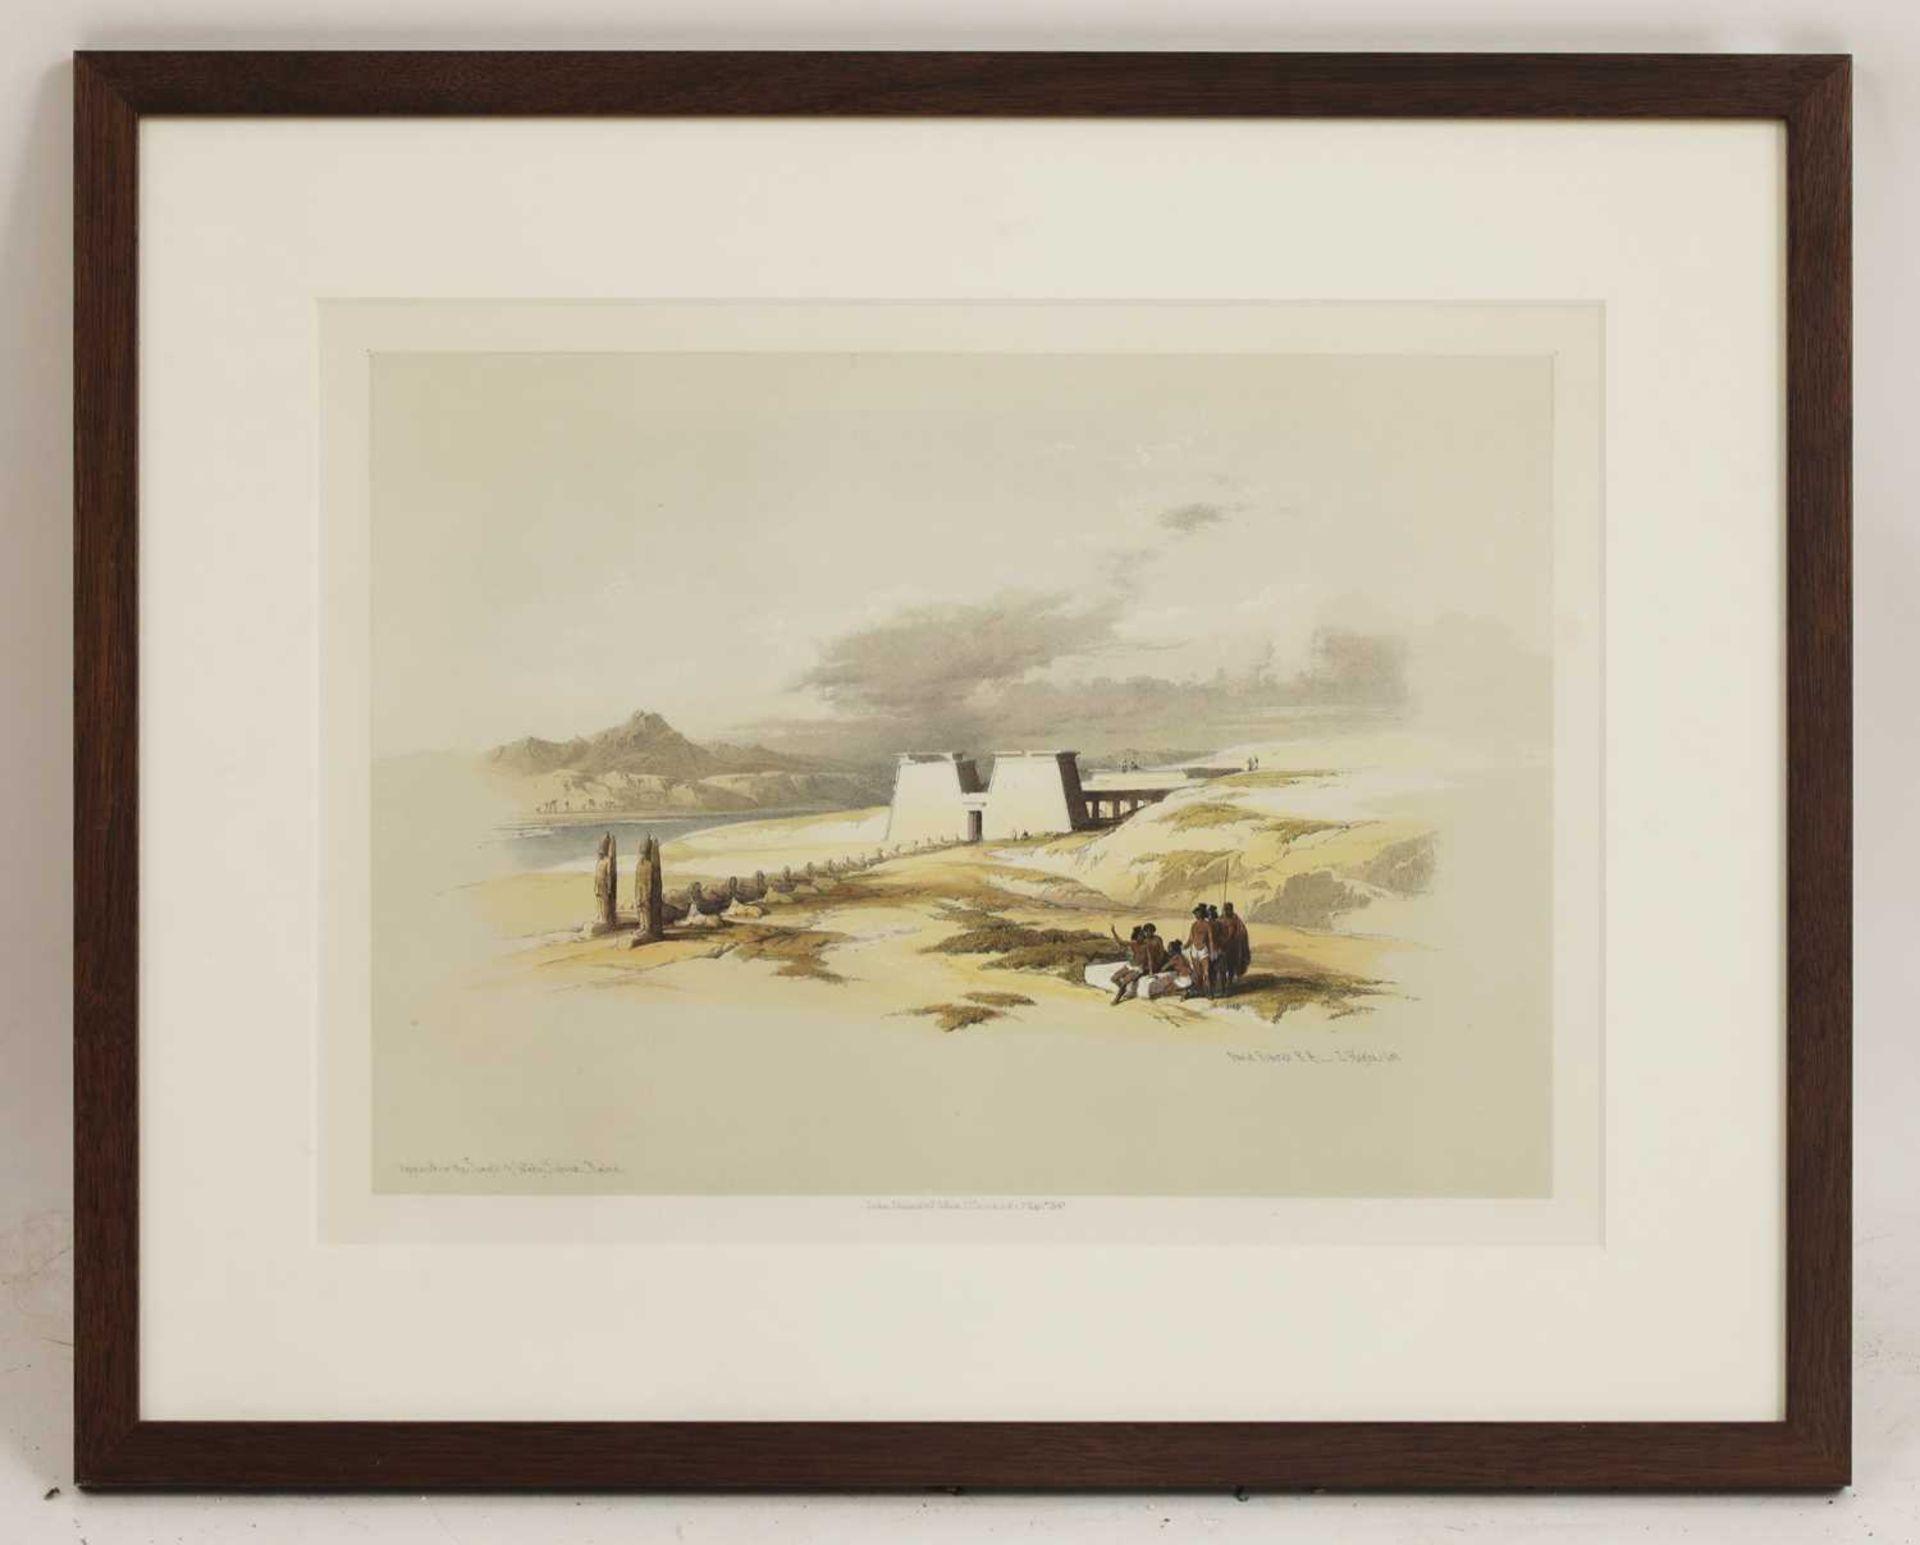 Louis Haghe after David Roberts RA (1796-1864) - Image 12 of 20